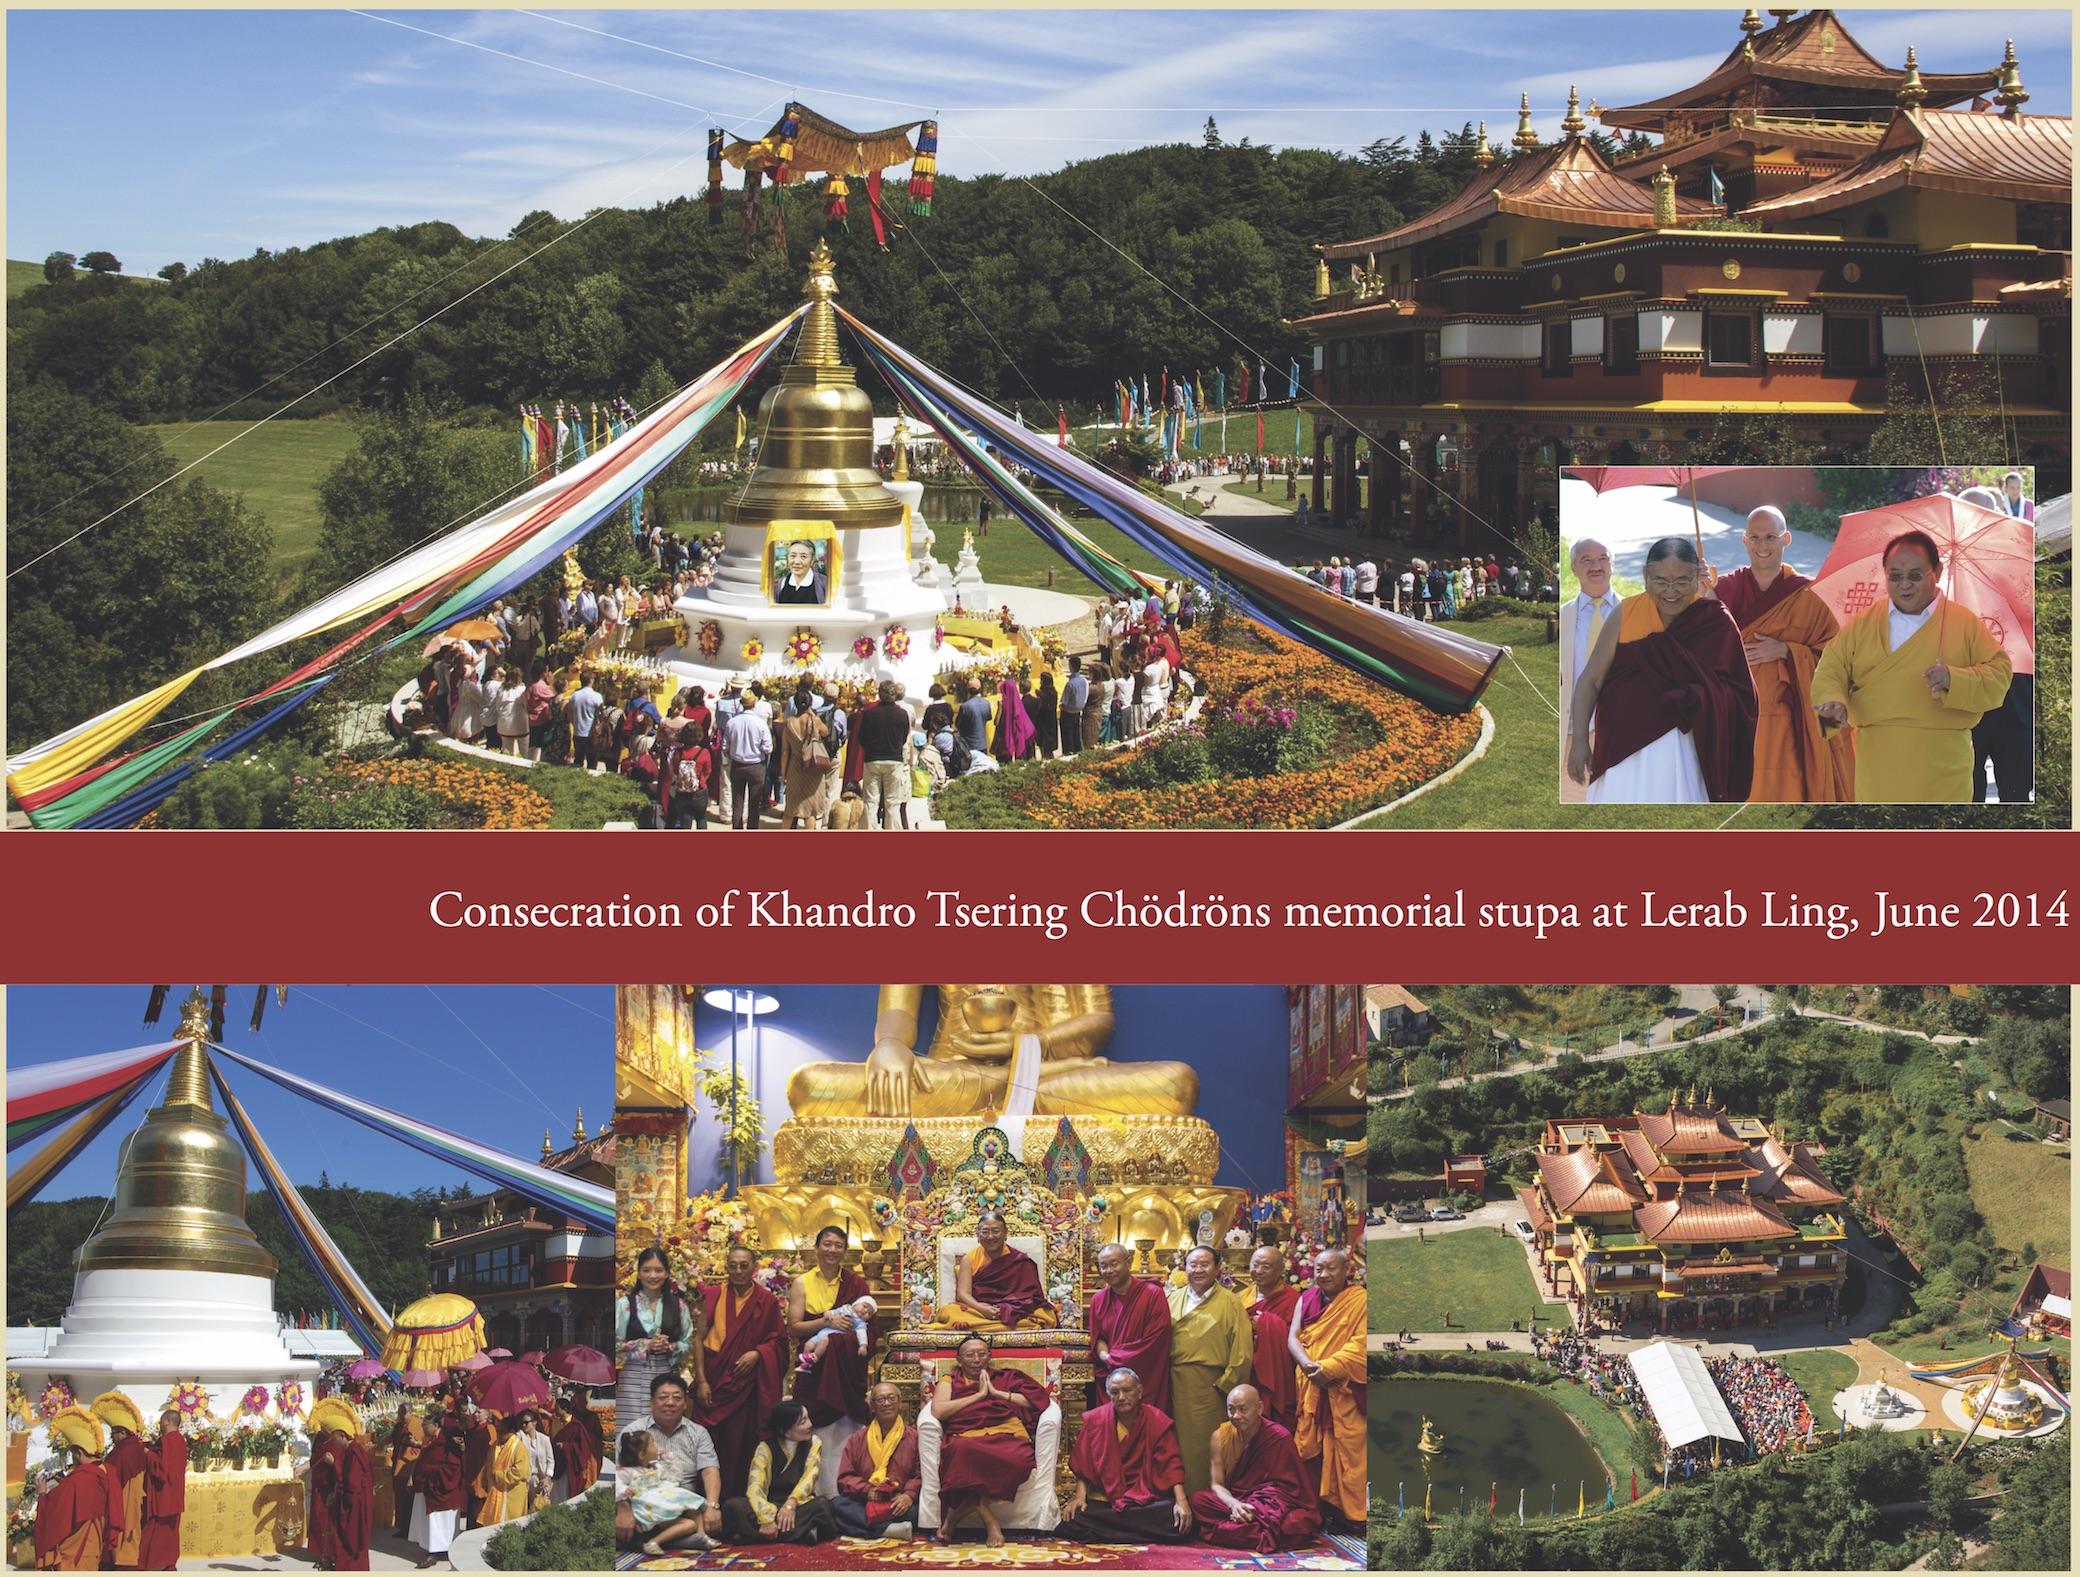 Consecration of Khandro Tsering Chödröns memorial stupa at Lerab Ling, June 2014